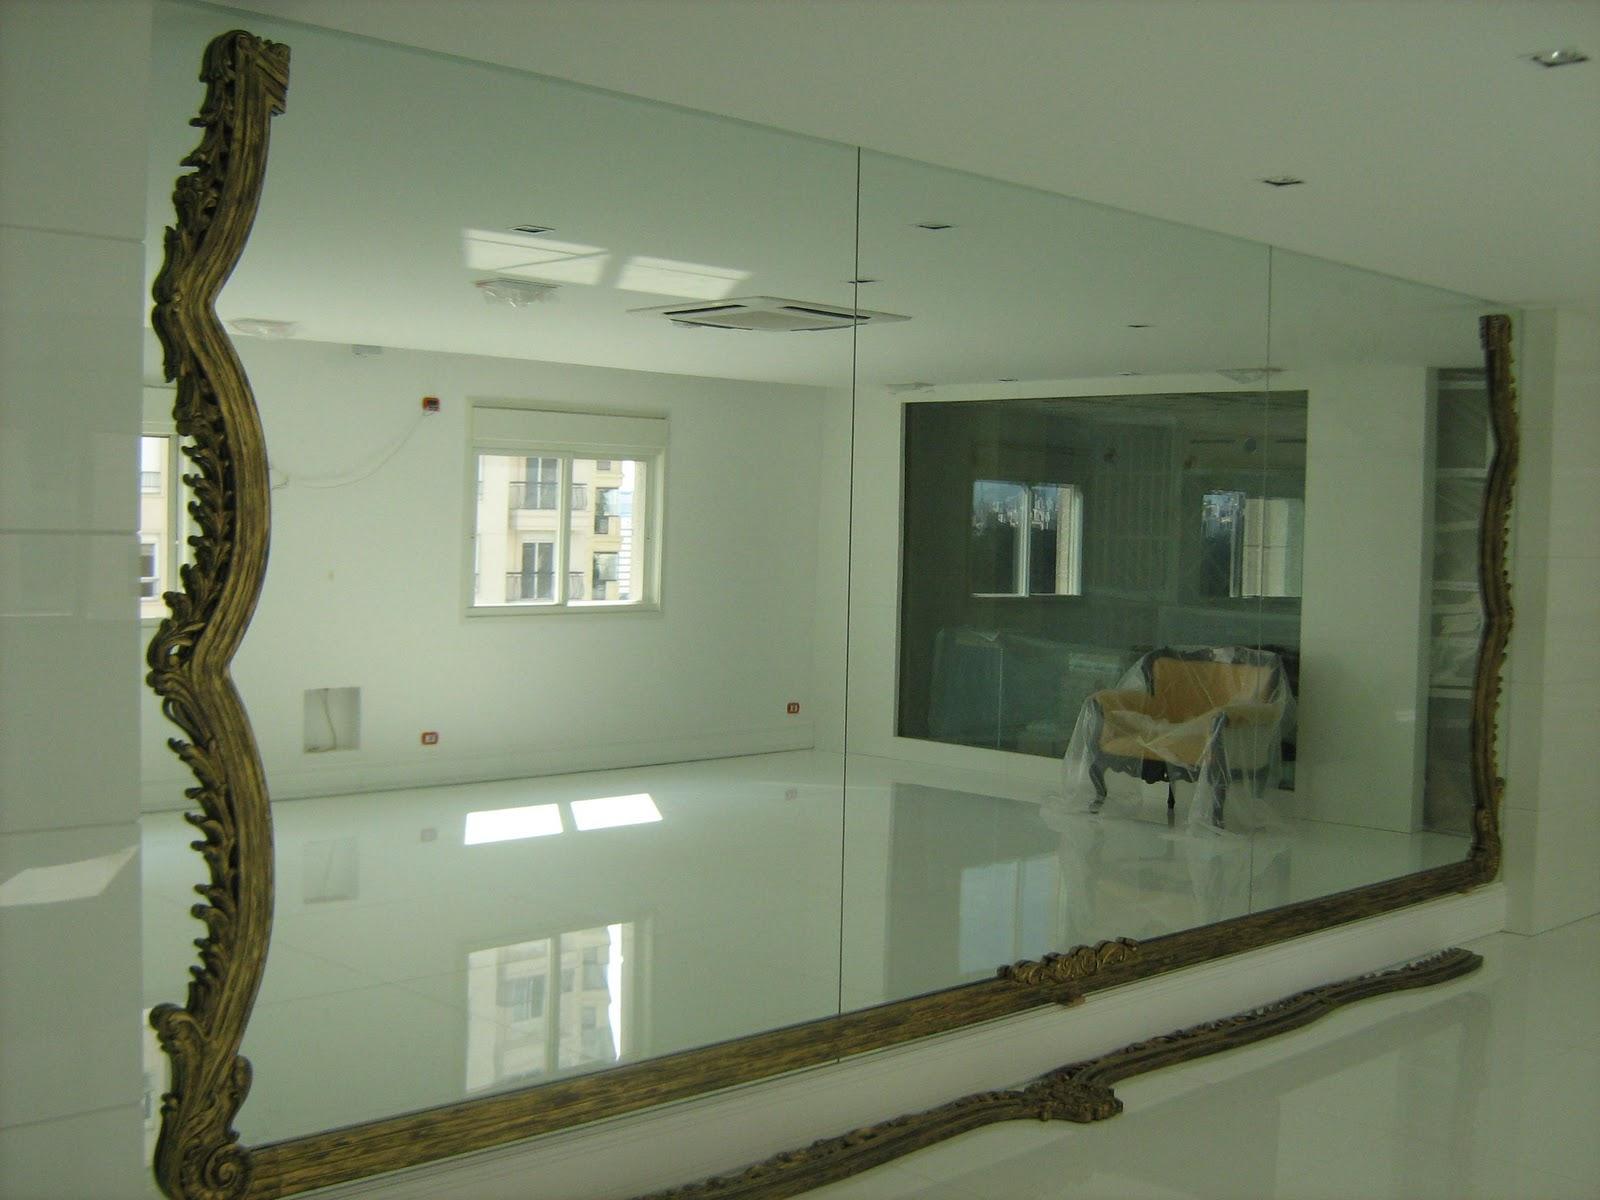 decoracao de interiores artesanal:Blog Decoração de Interiores: Arquitetura Decoração Interiores SP